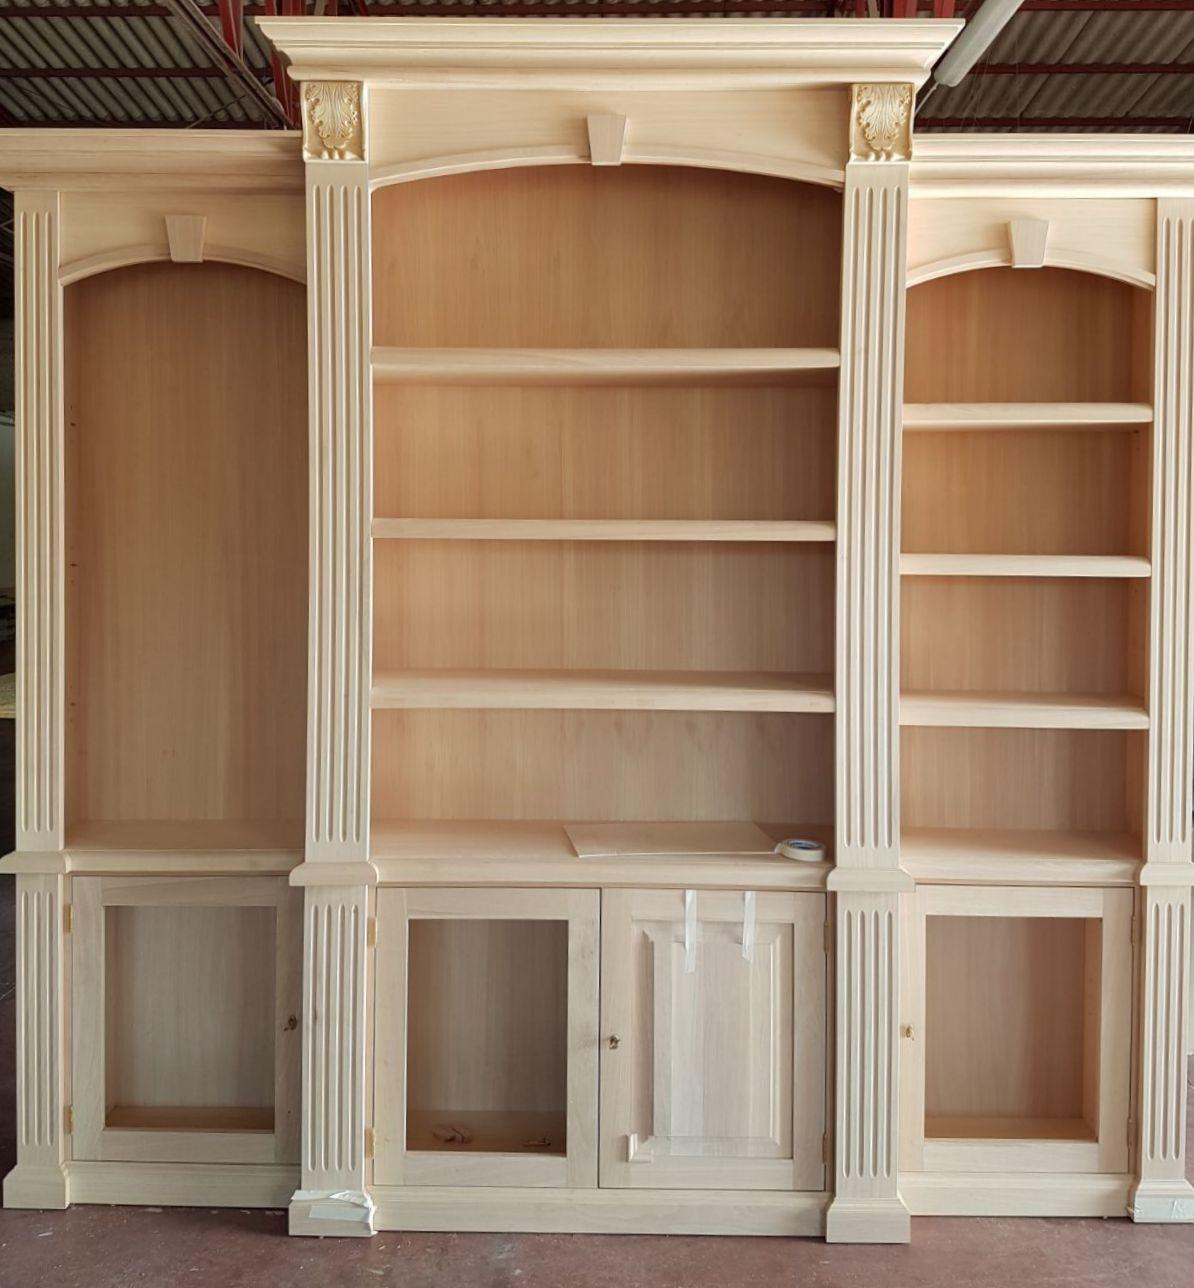 Libreria Per Libri Pesanti falegnamerie artigianali | librerie su misura